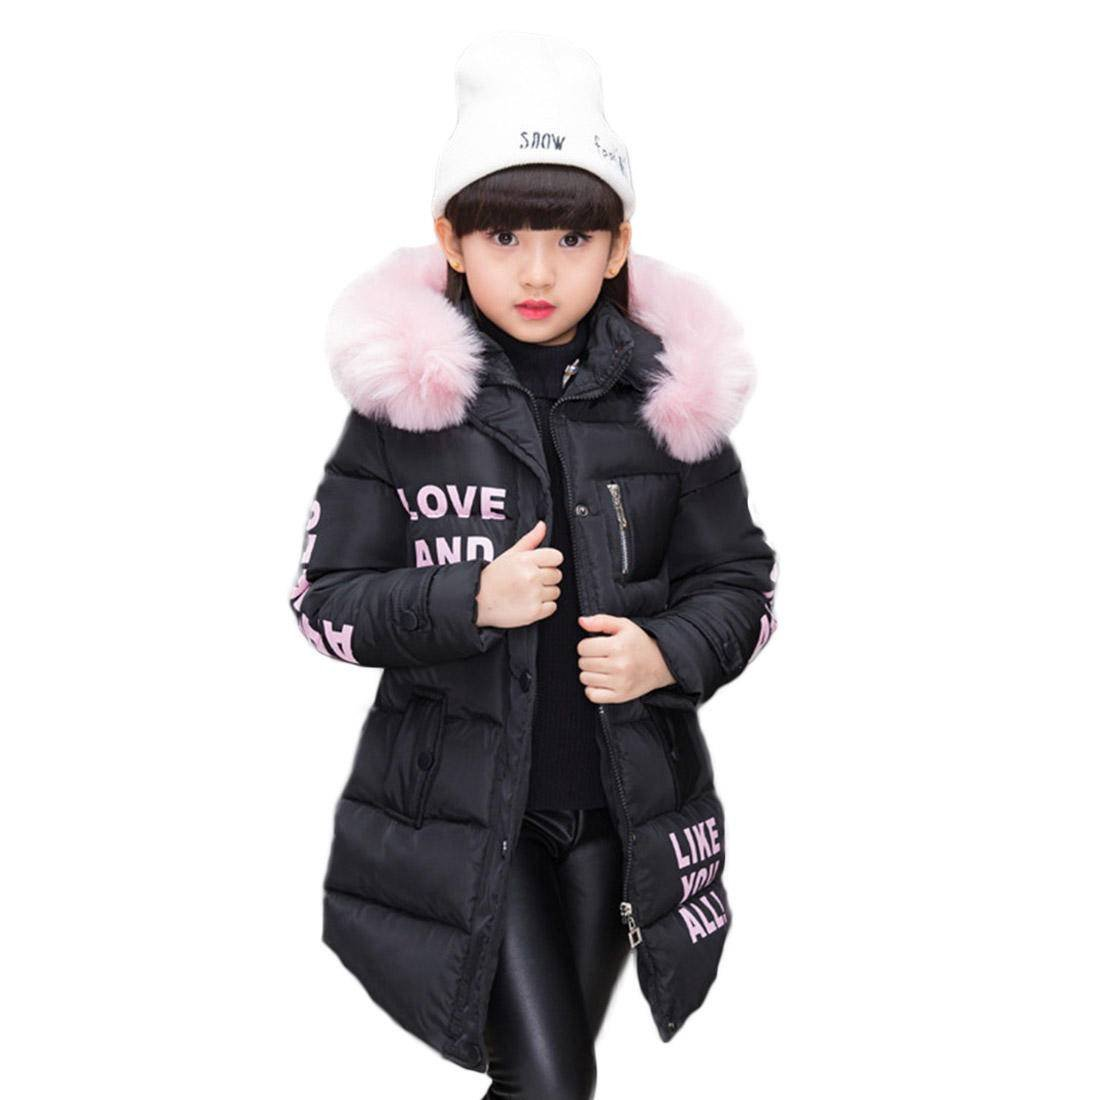 Abrigo para niña con capucha de pelo, largo, Akaufeng, chaqueta de invierno con capucha de pelos, capa exterior, chaqueta infantil